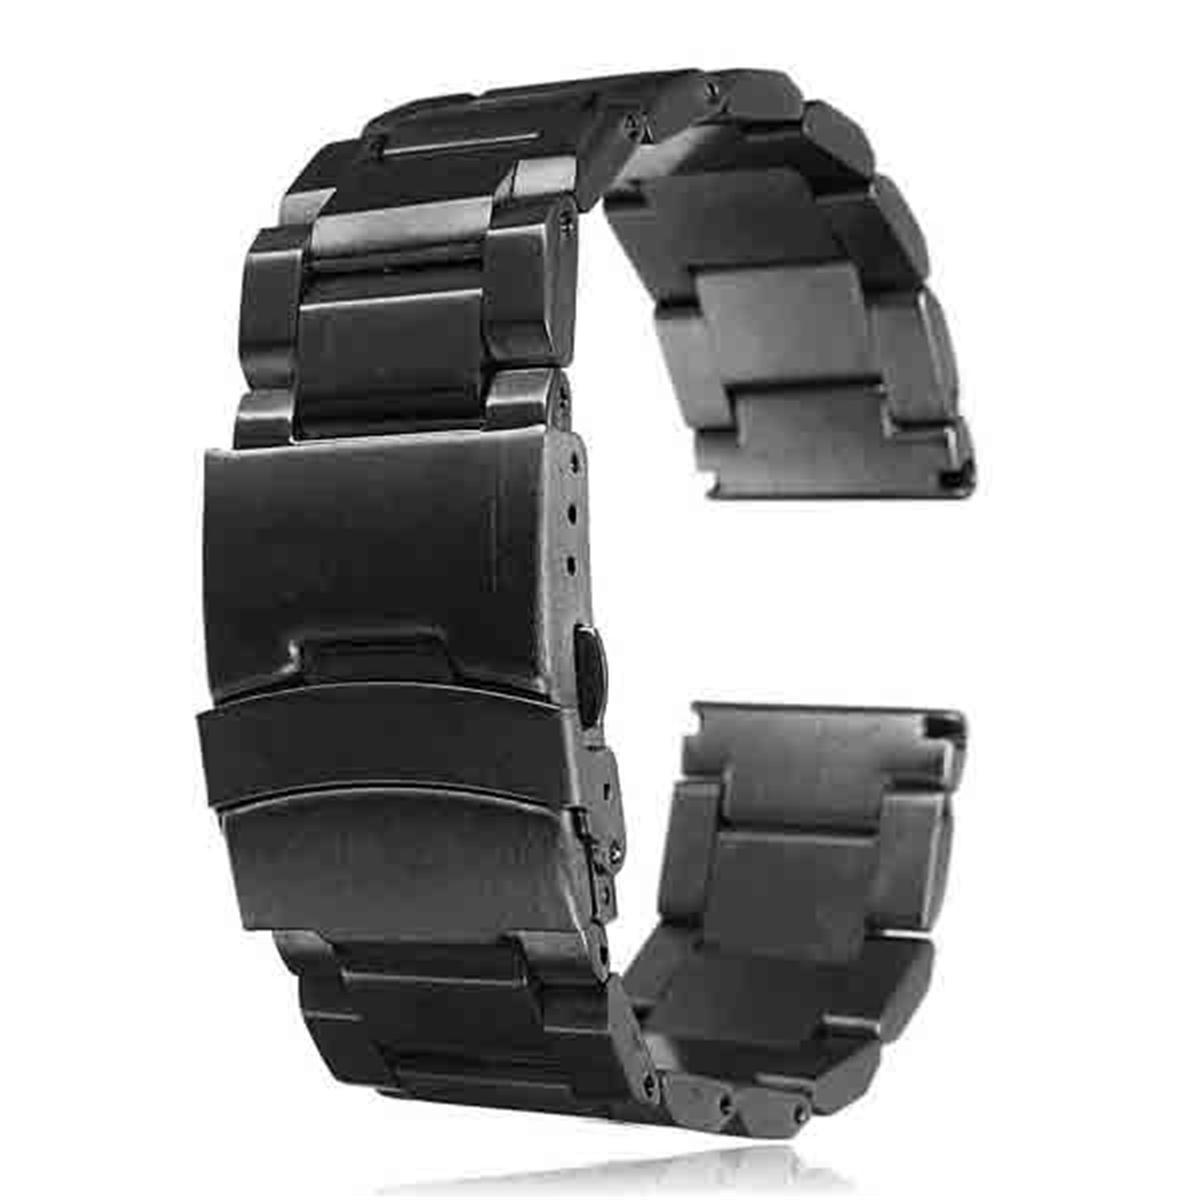 WatchBand New Arrival 22mm Stainless Steel Man Fashion Watch Strap Double Lock Flip Bracelet Straight End Wholesale цена 2017